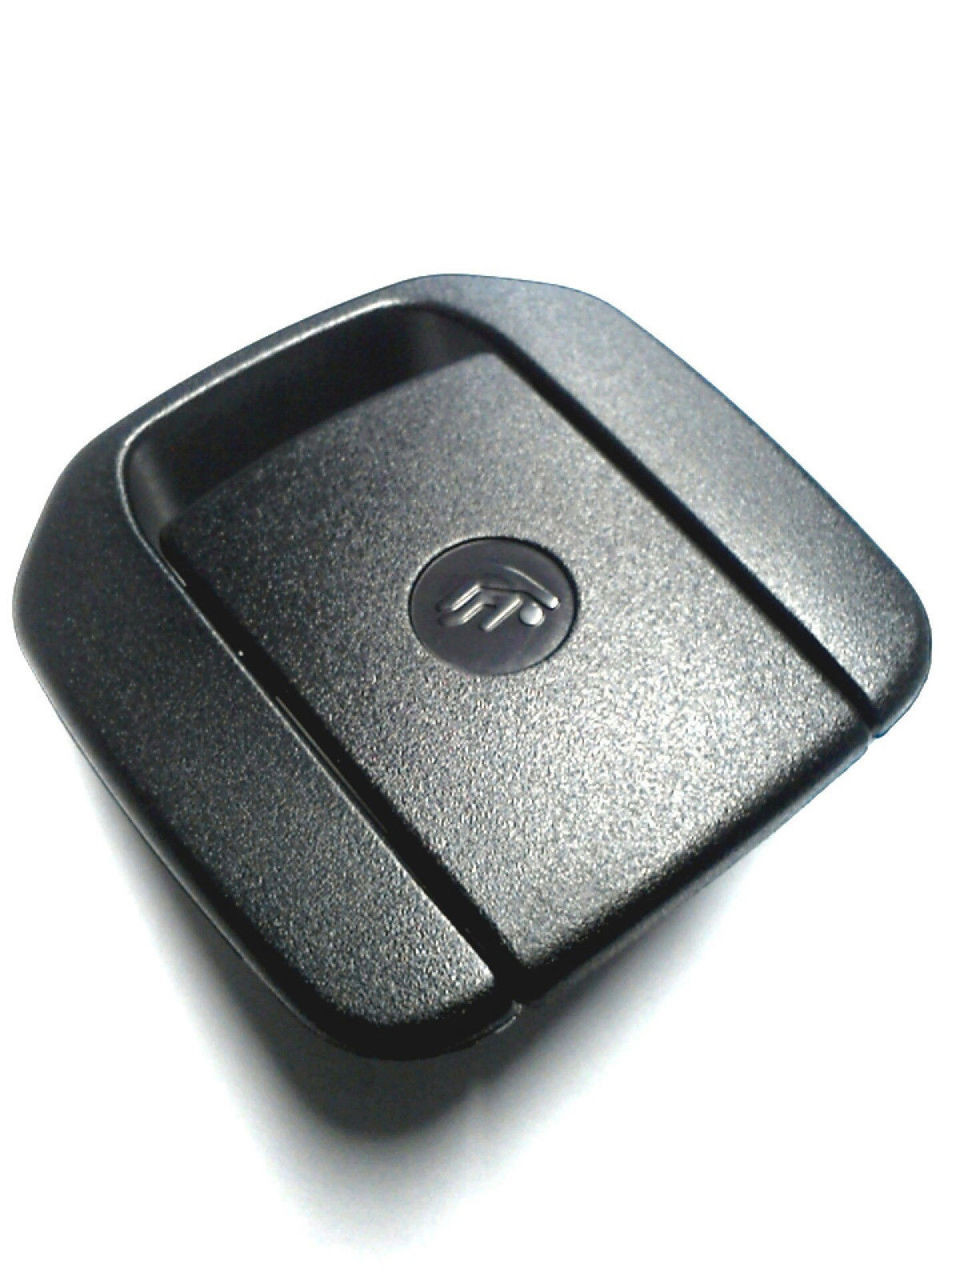 Genuine BMW Rear Seat Hook Cover Child Restraint Black OEM 52207118674